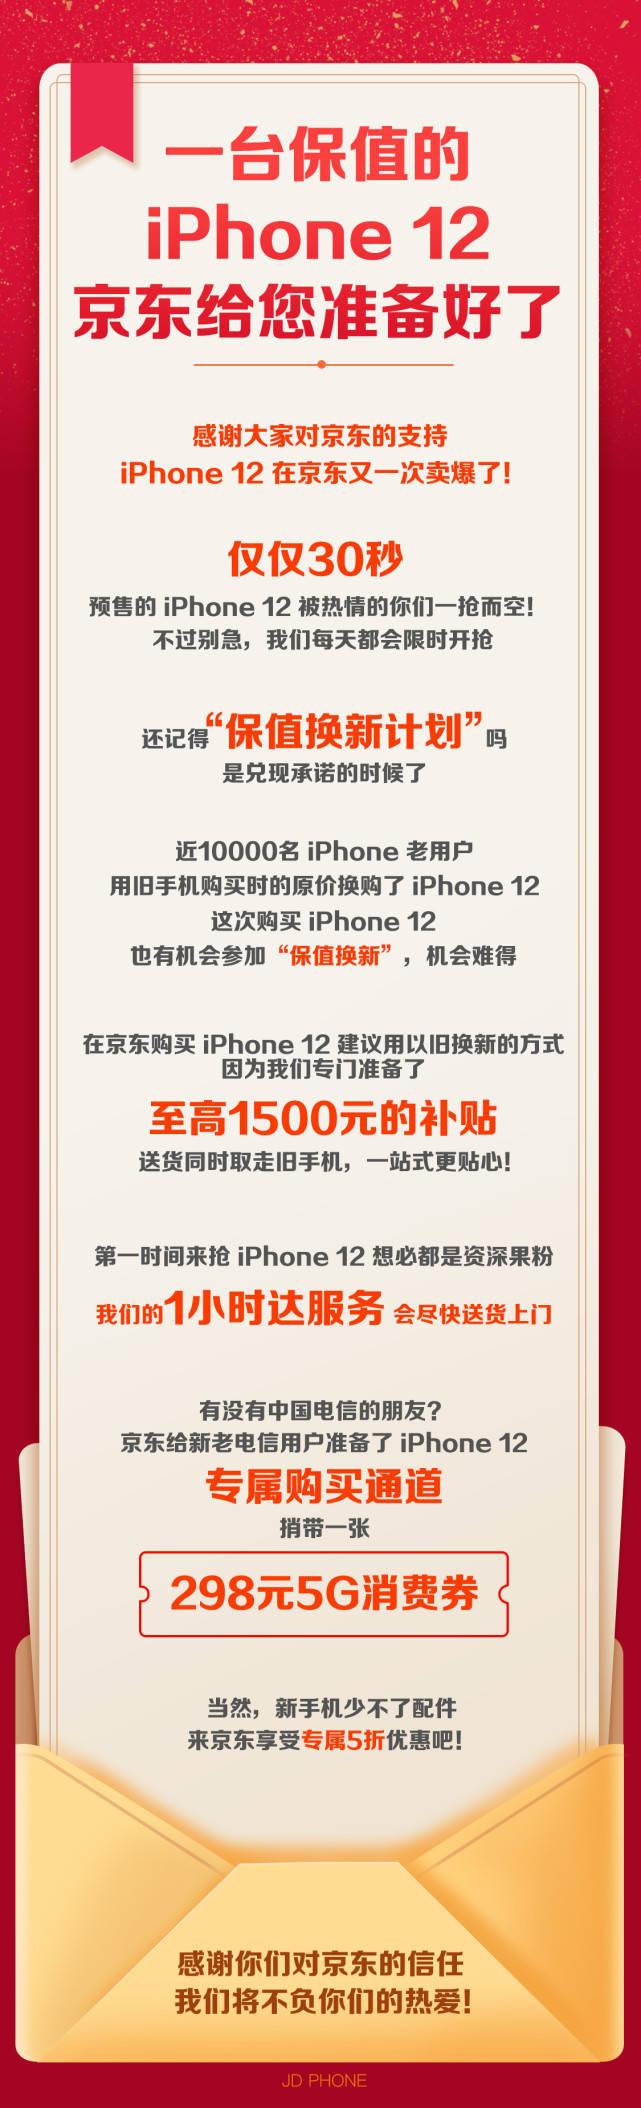 iPhone 12首销京东30秒售罄,原因竟然是这个……